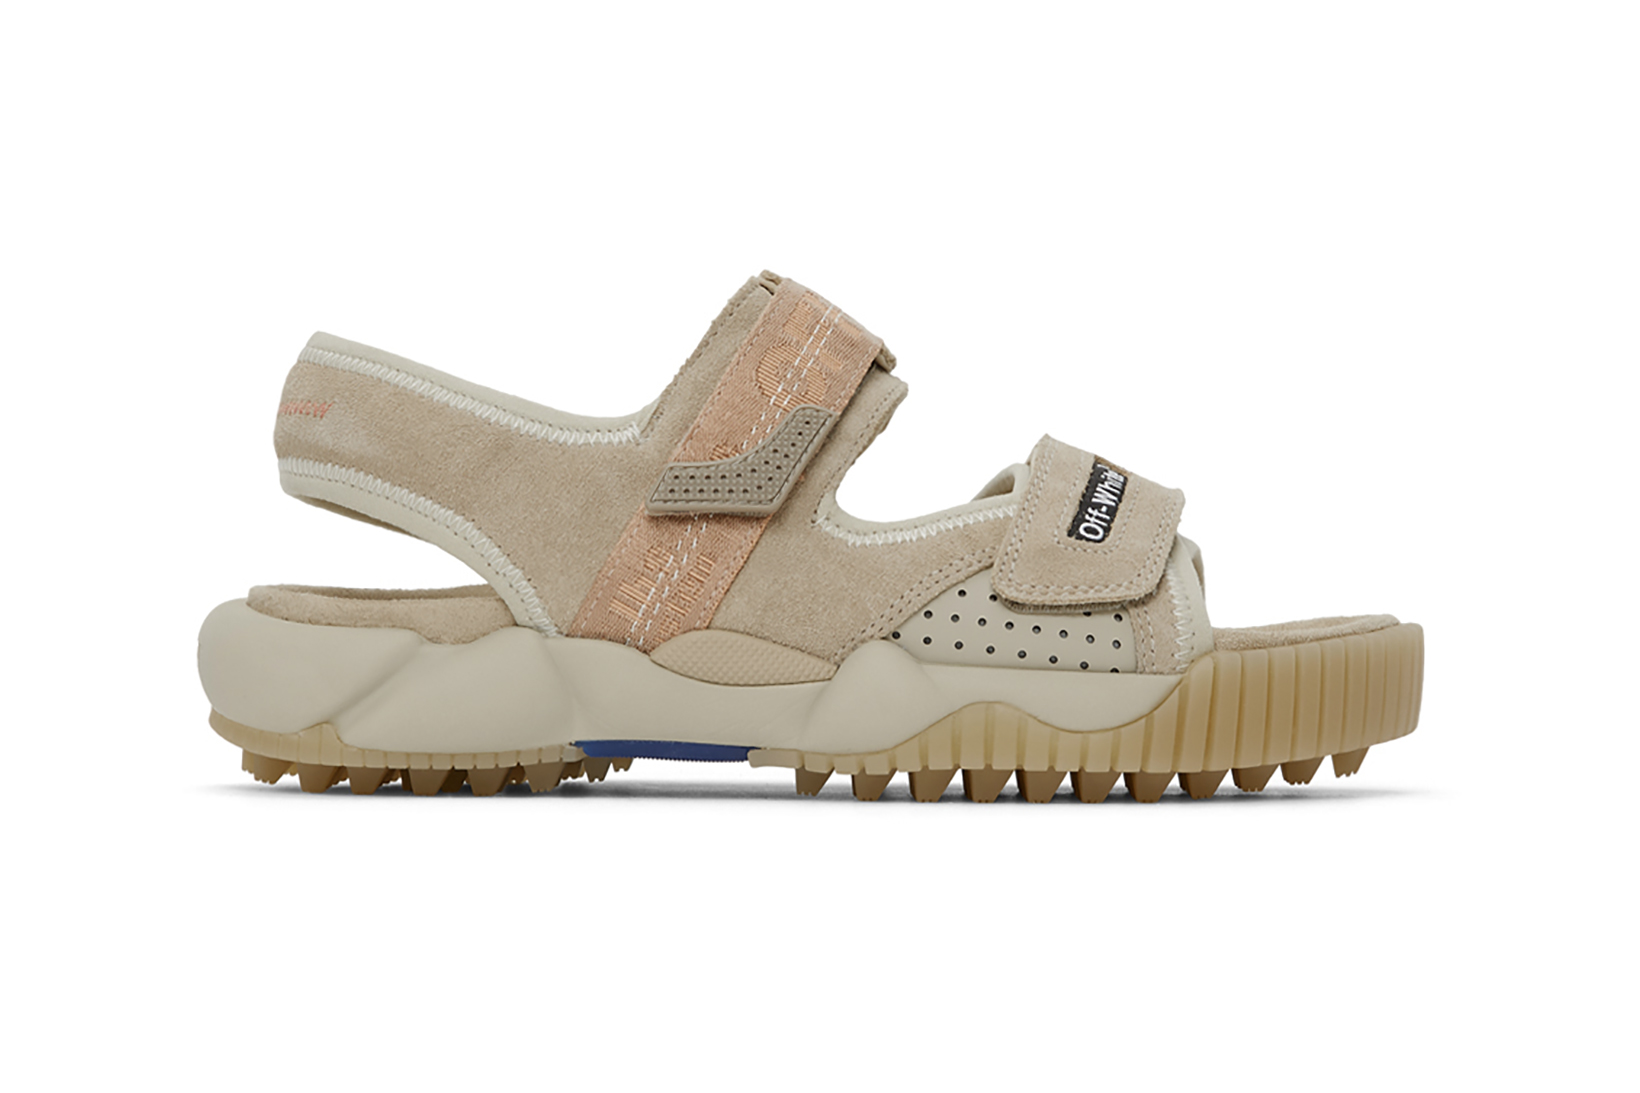 off-white-virgil-abloh-oddsy-minimal-trekking-sandals-blue-beige-black-shoes-release-4